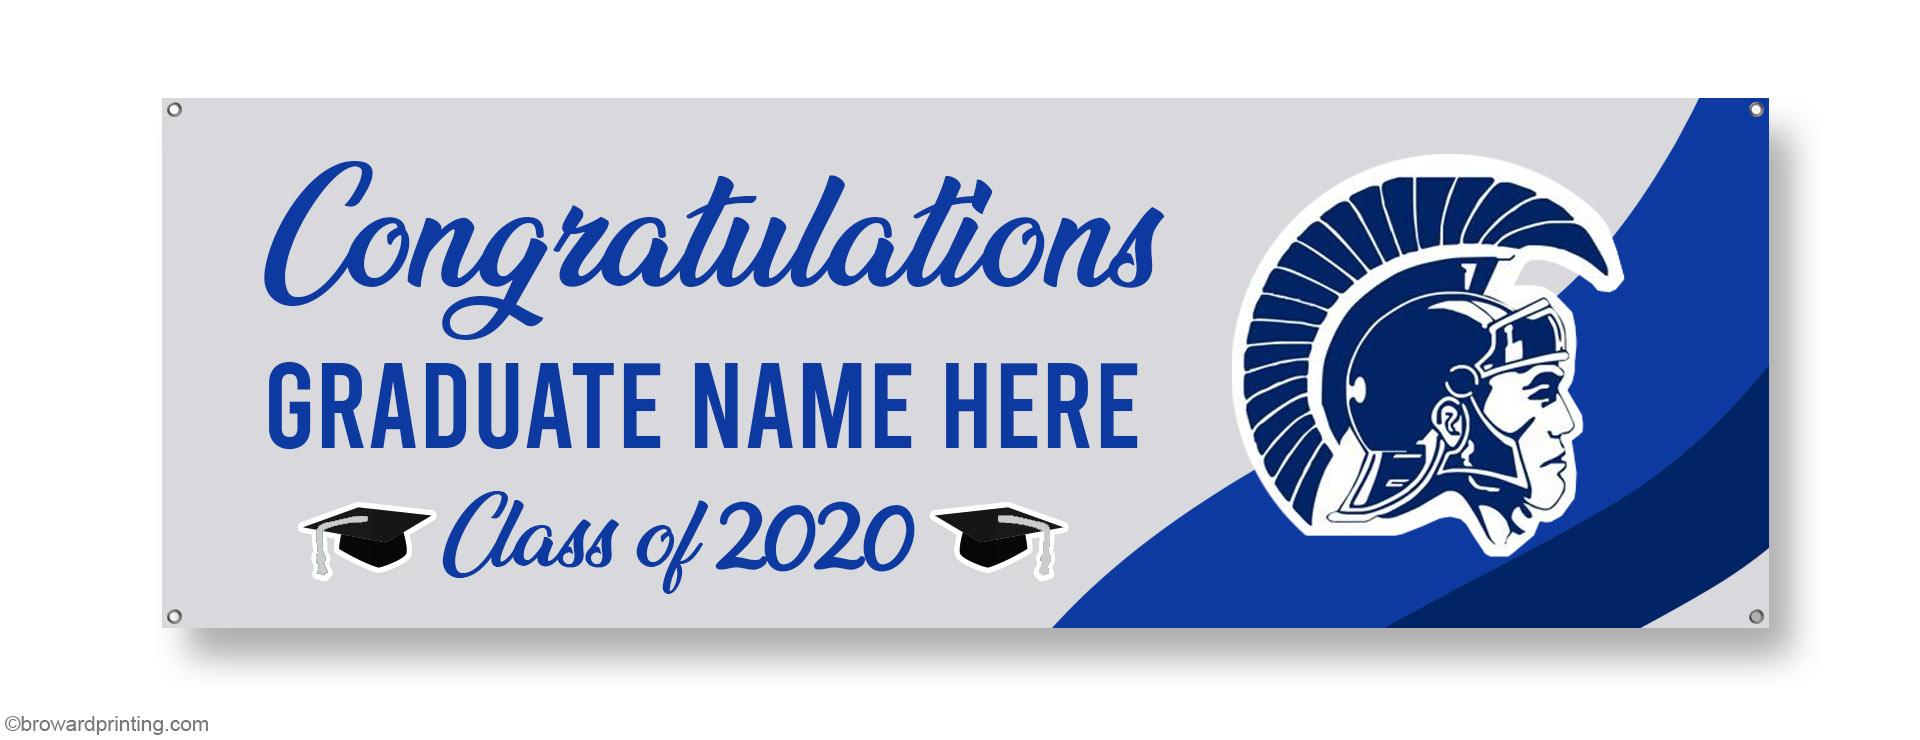 JPT graduation banner 1